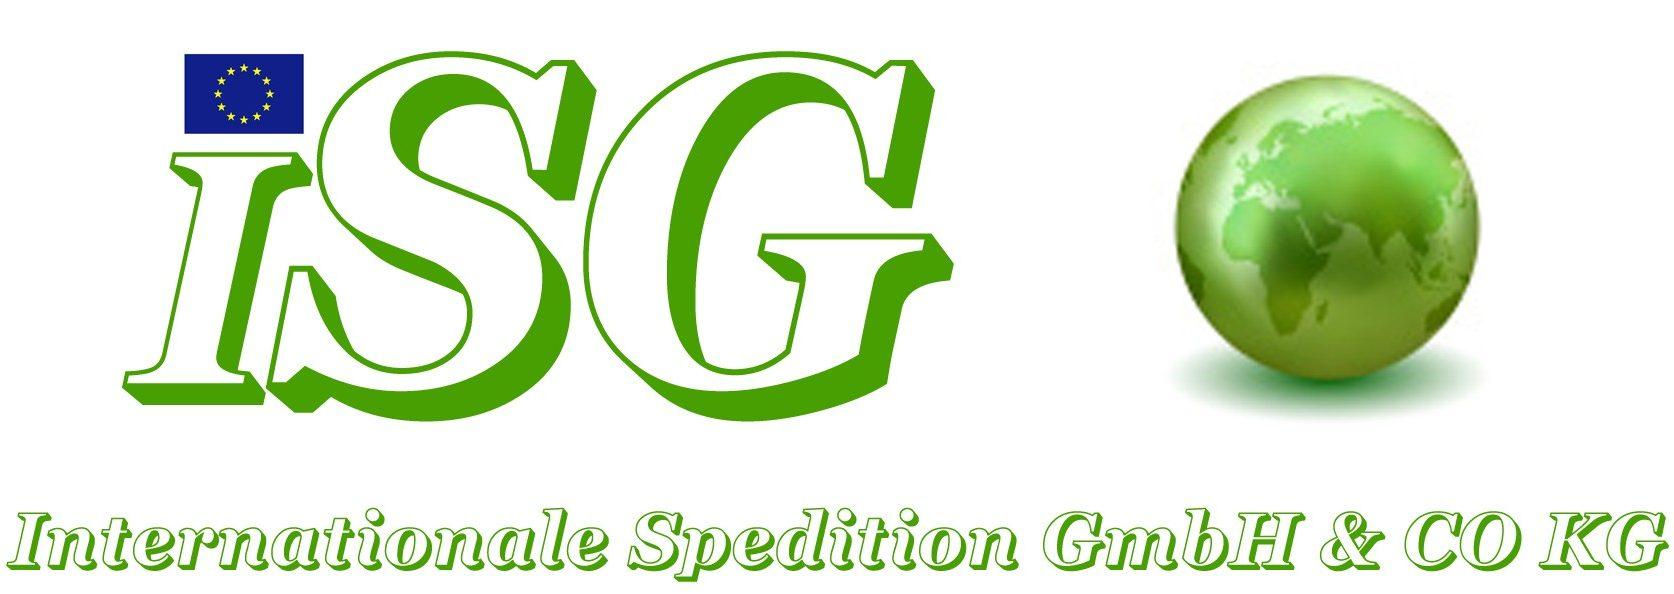 Internationale Spedition GmbH & Co.KG